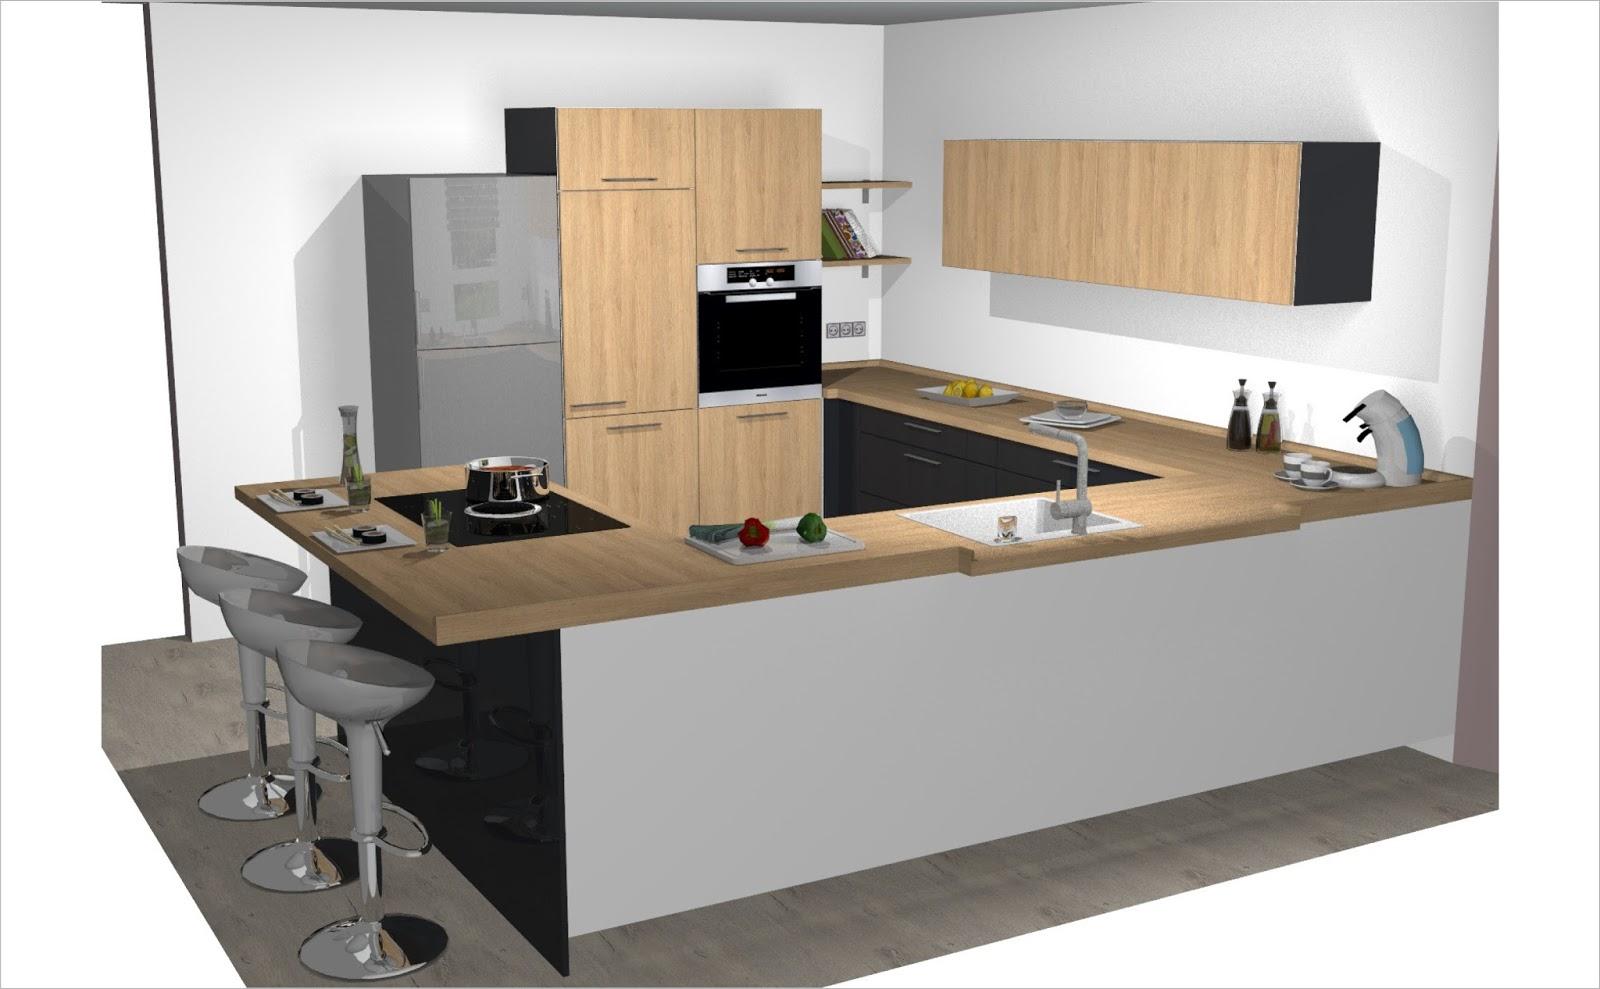 k chenplanung was kostet eine gro e k che. Black Bedroom Furniture Sets. Home Design Ideas